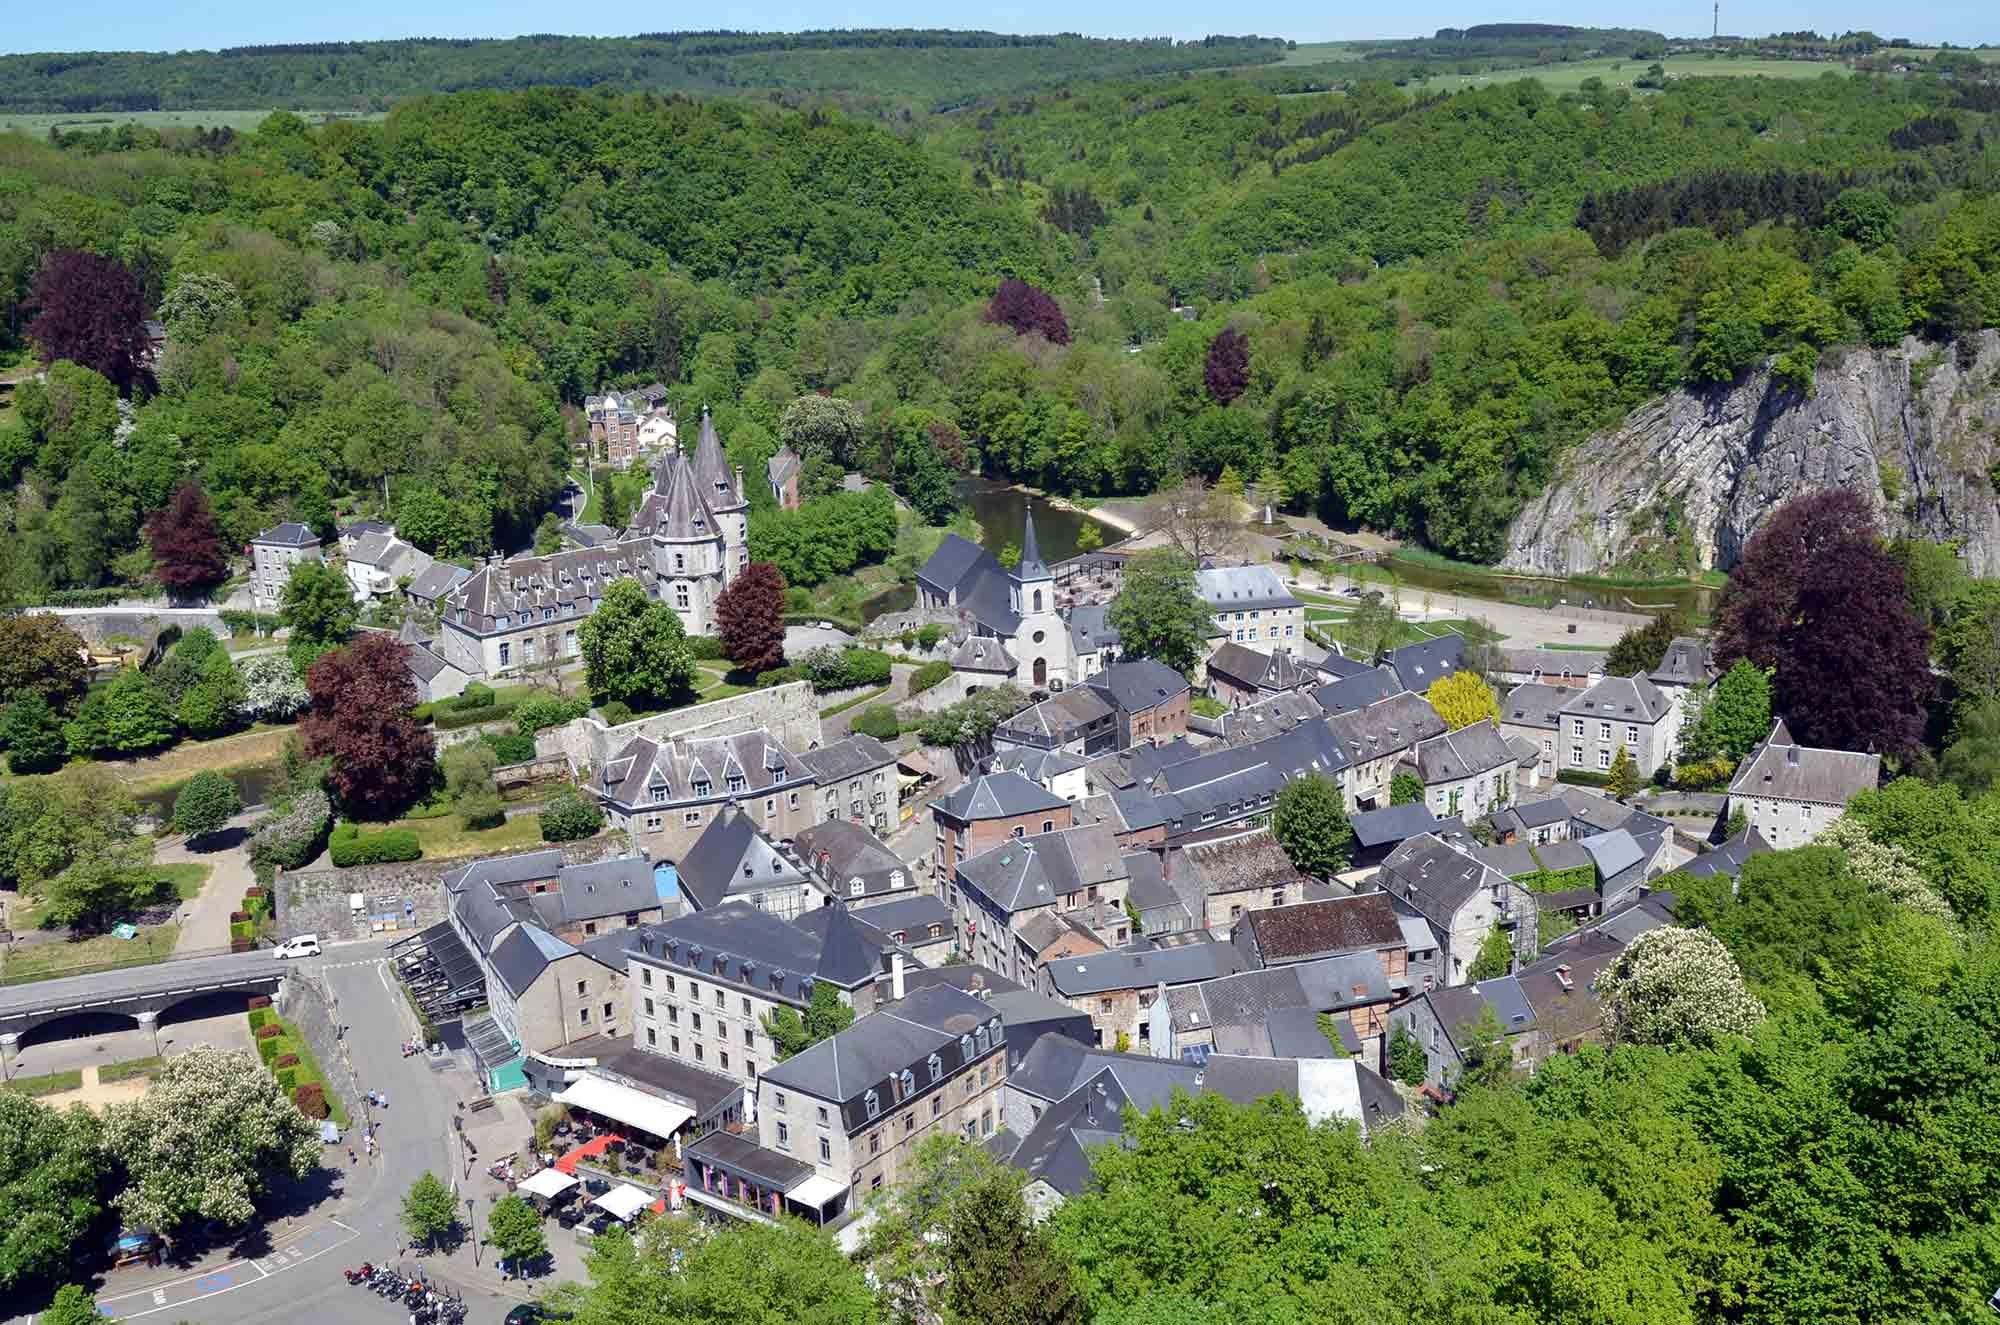 ardenne residences durbuy 6940 region landscapes city aerial image